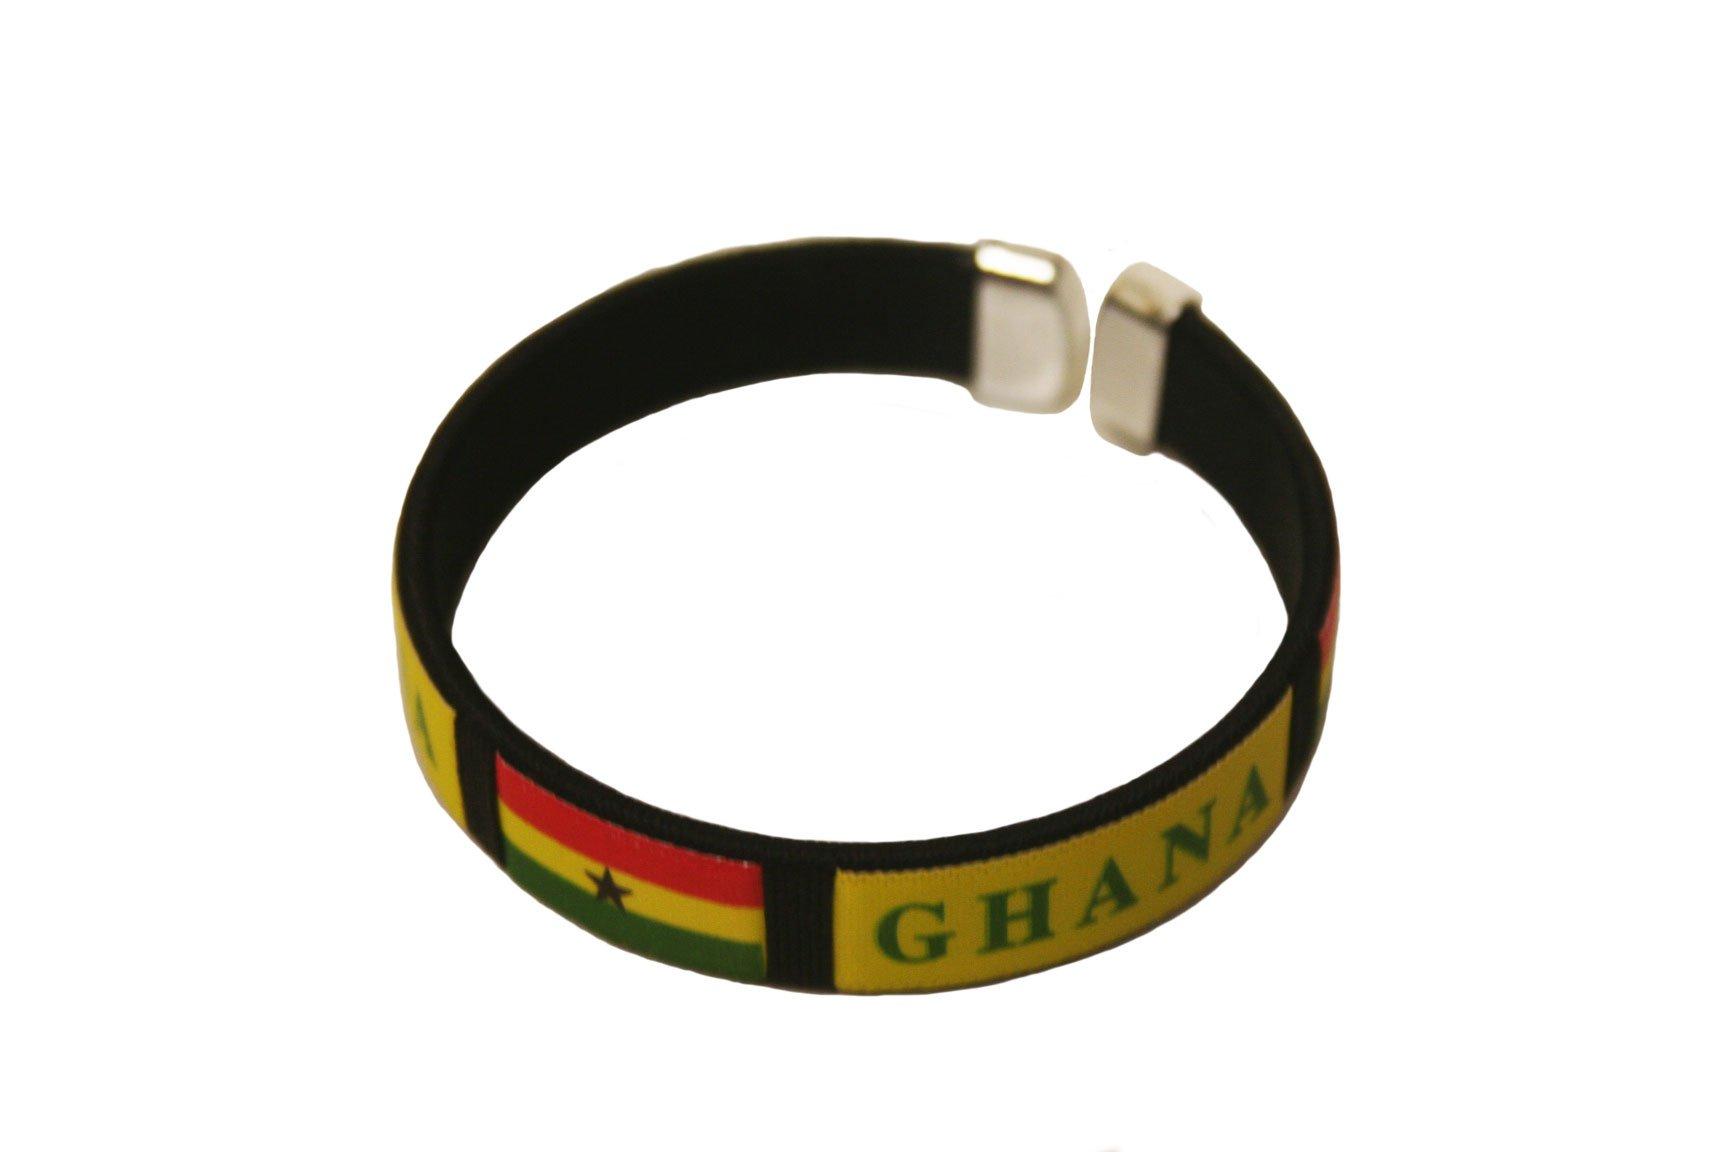 SUPERDAVES SUPERSTORE Ghana Black Country Flag C' Bracelet Wristband. New